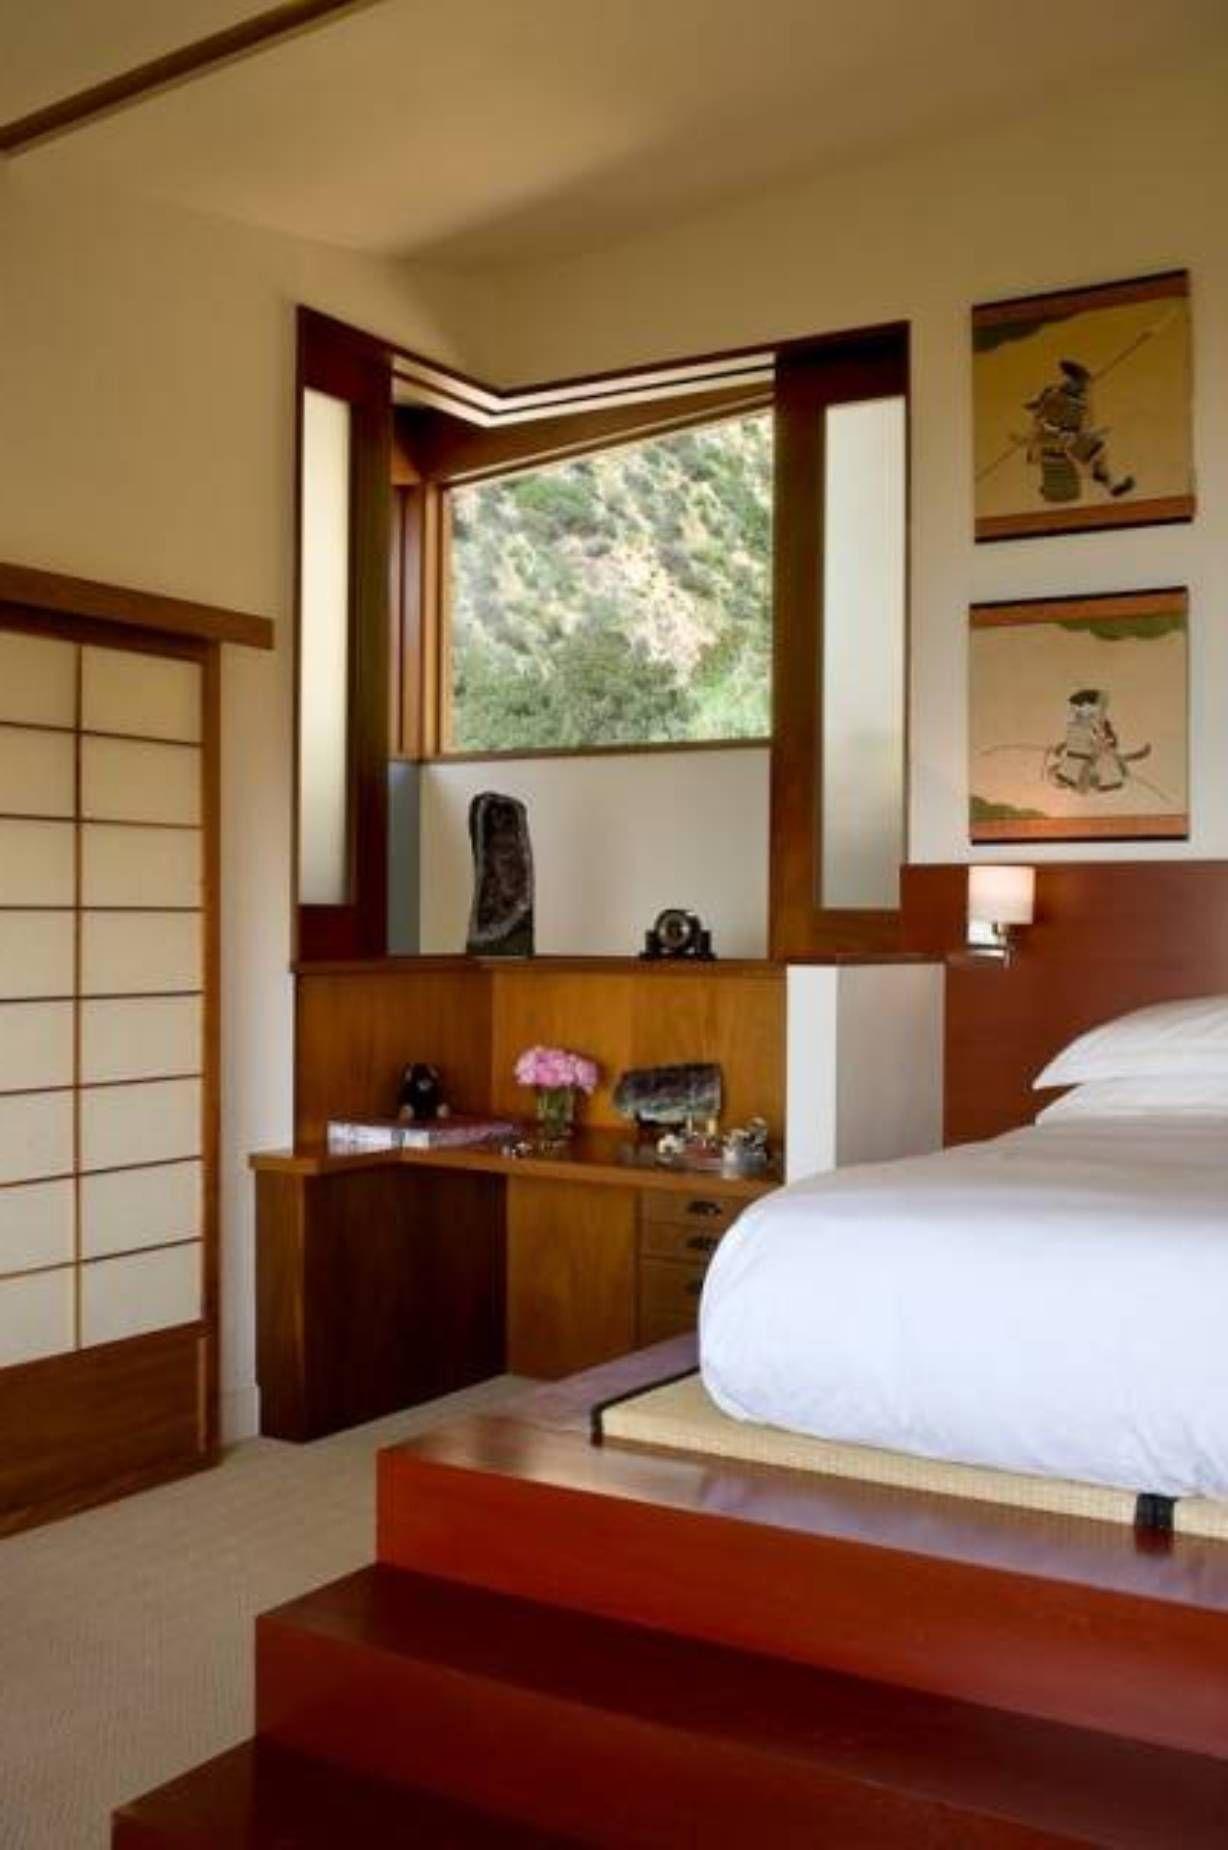 Simple house interior design ideas japanese interior decorating ideas  interior decorating japanese